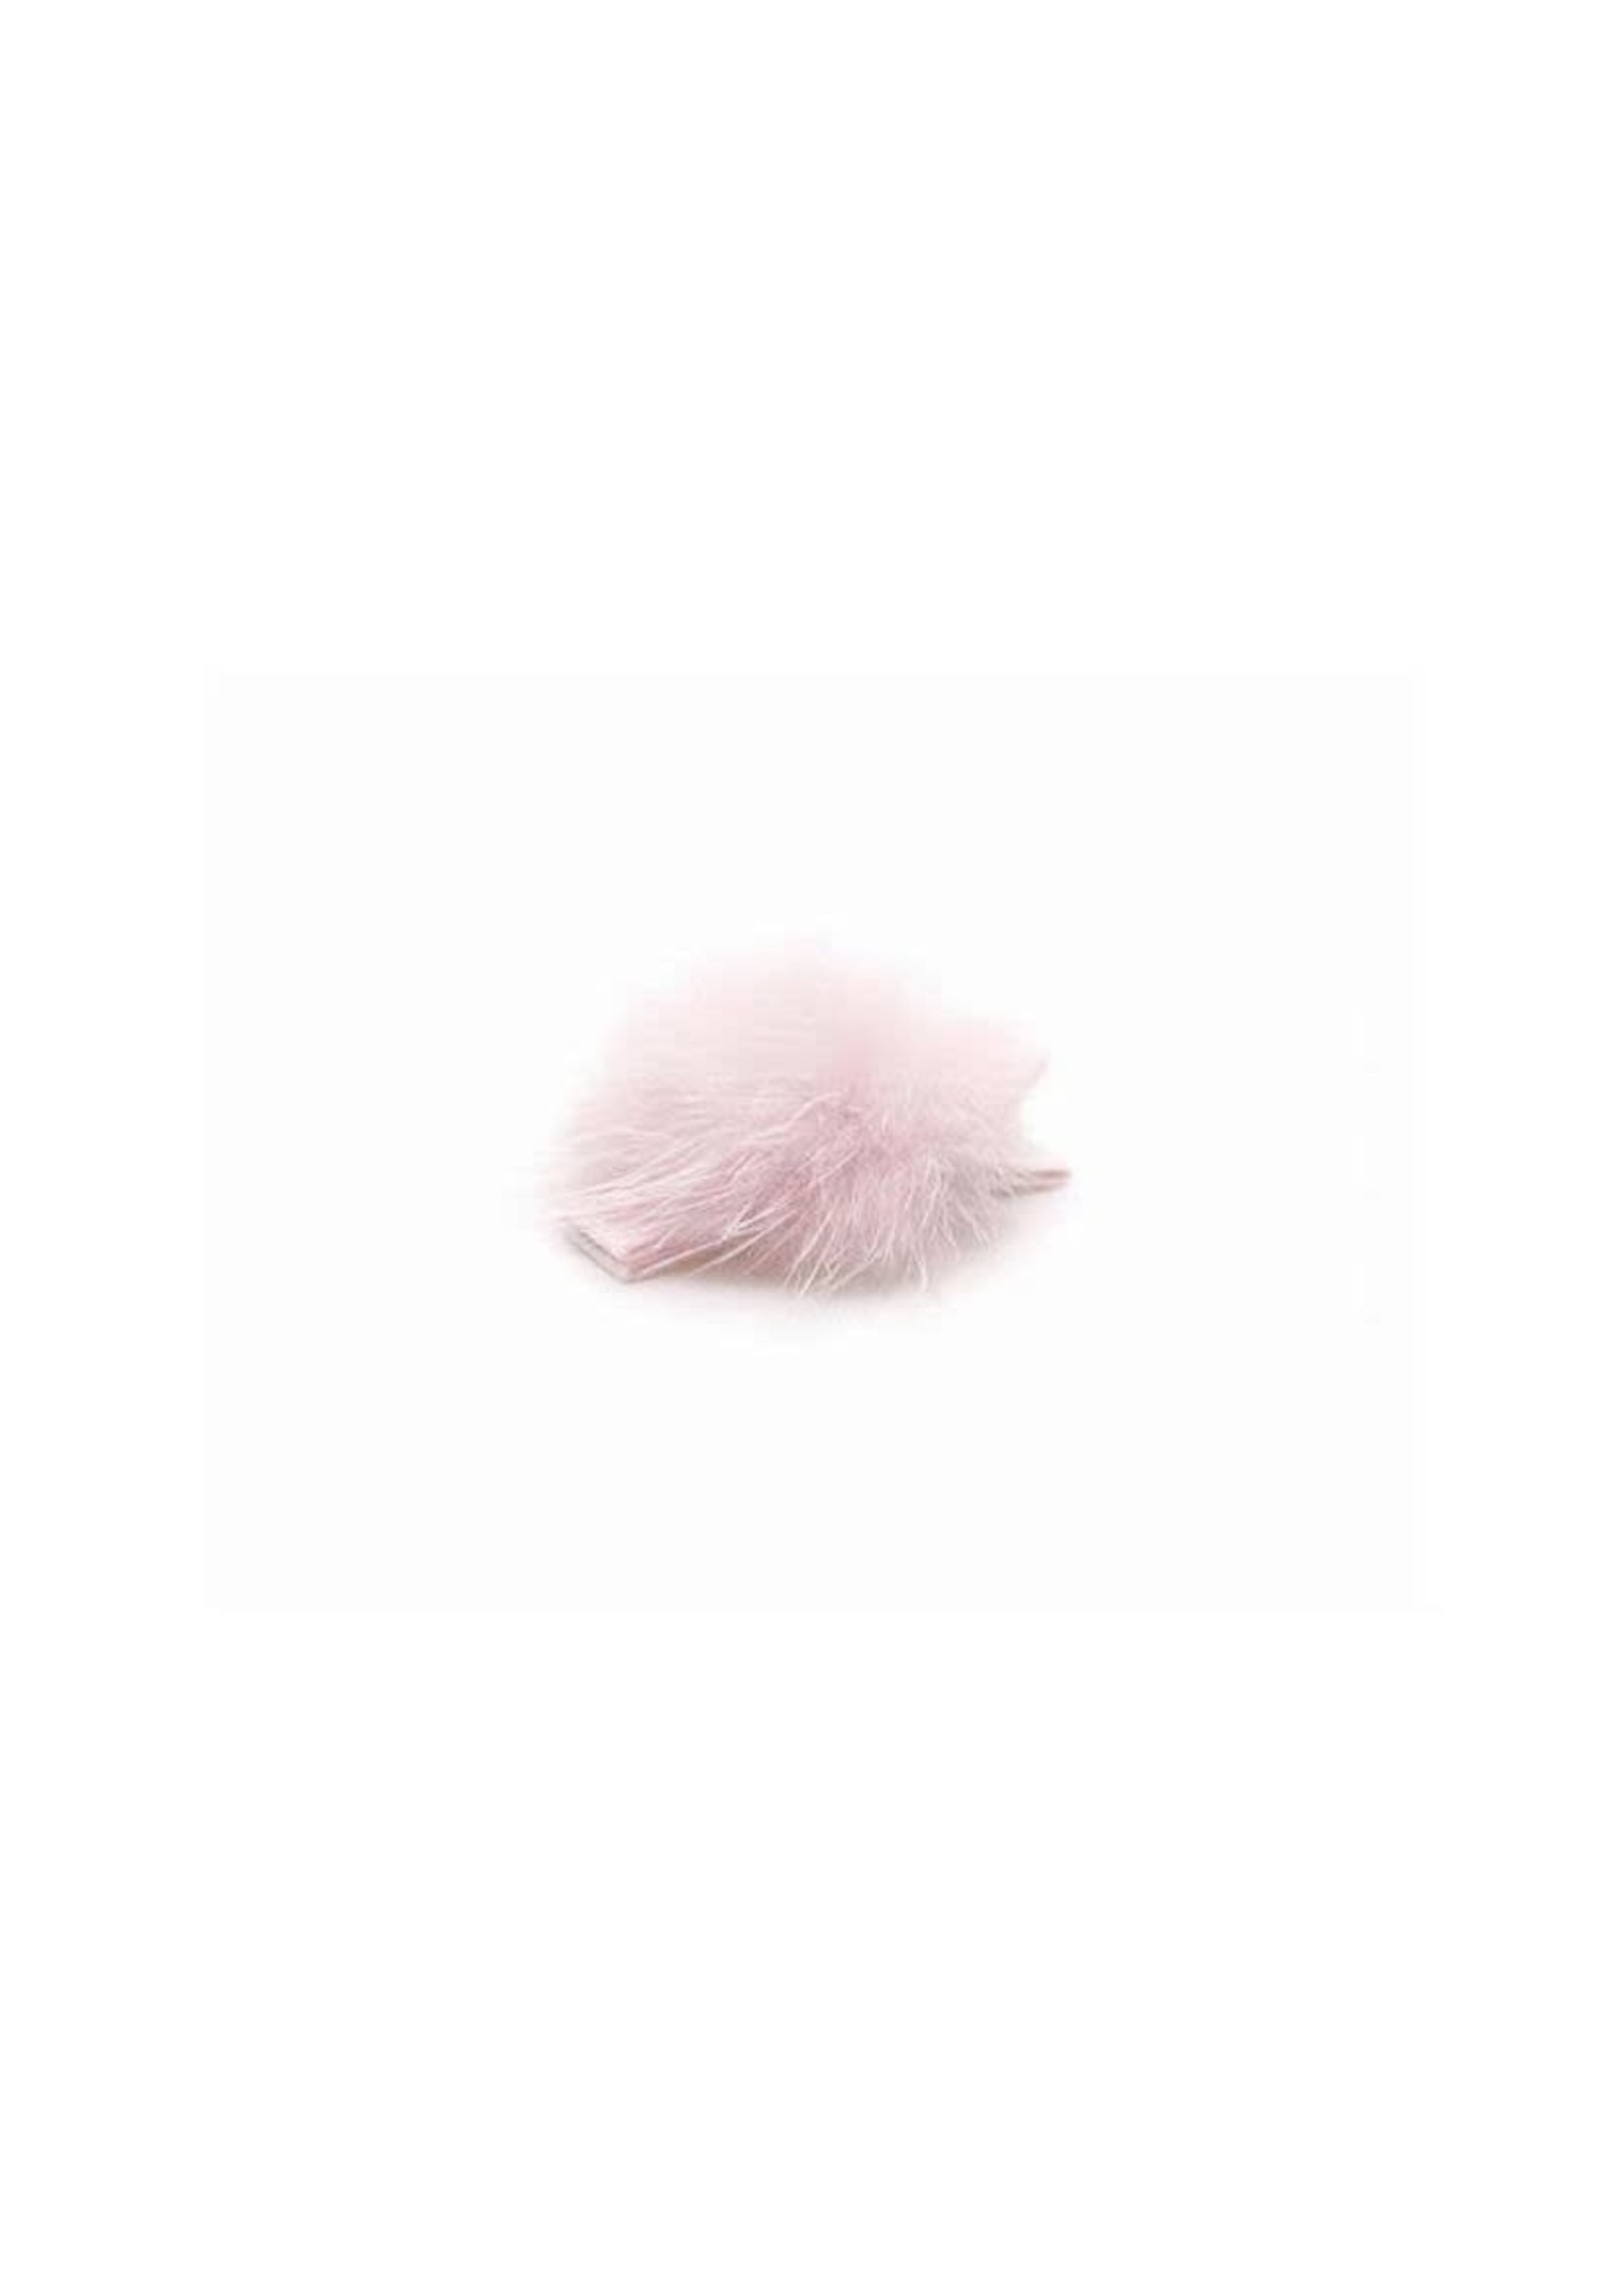 olilia Olilia Small Mink Puff Hair Clip - Powder Pink